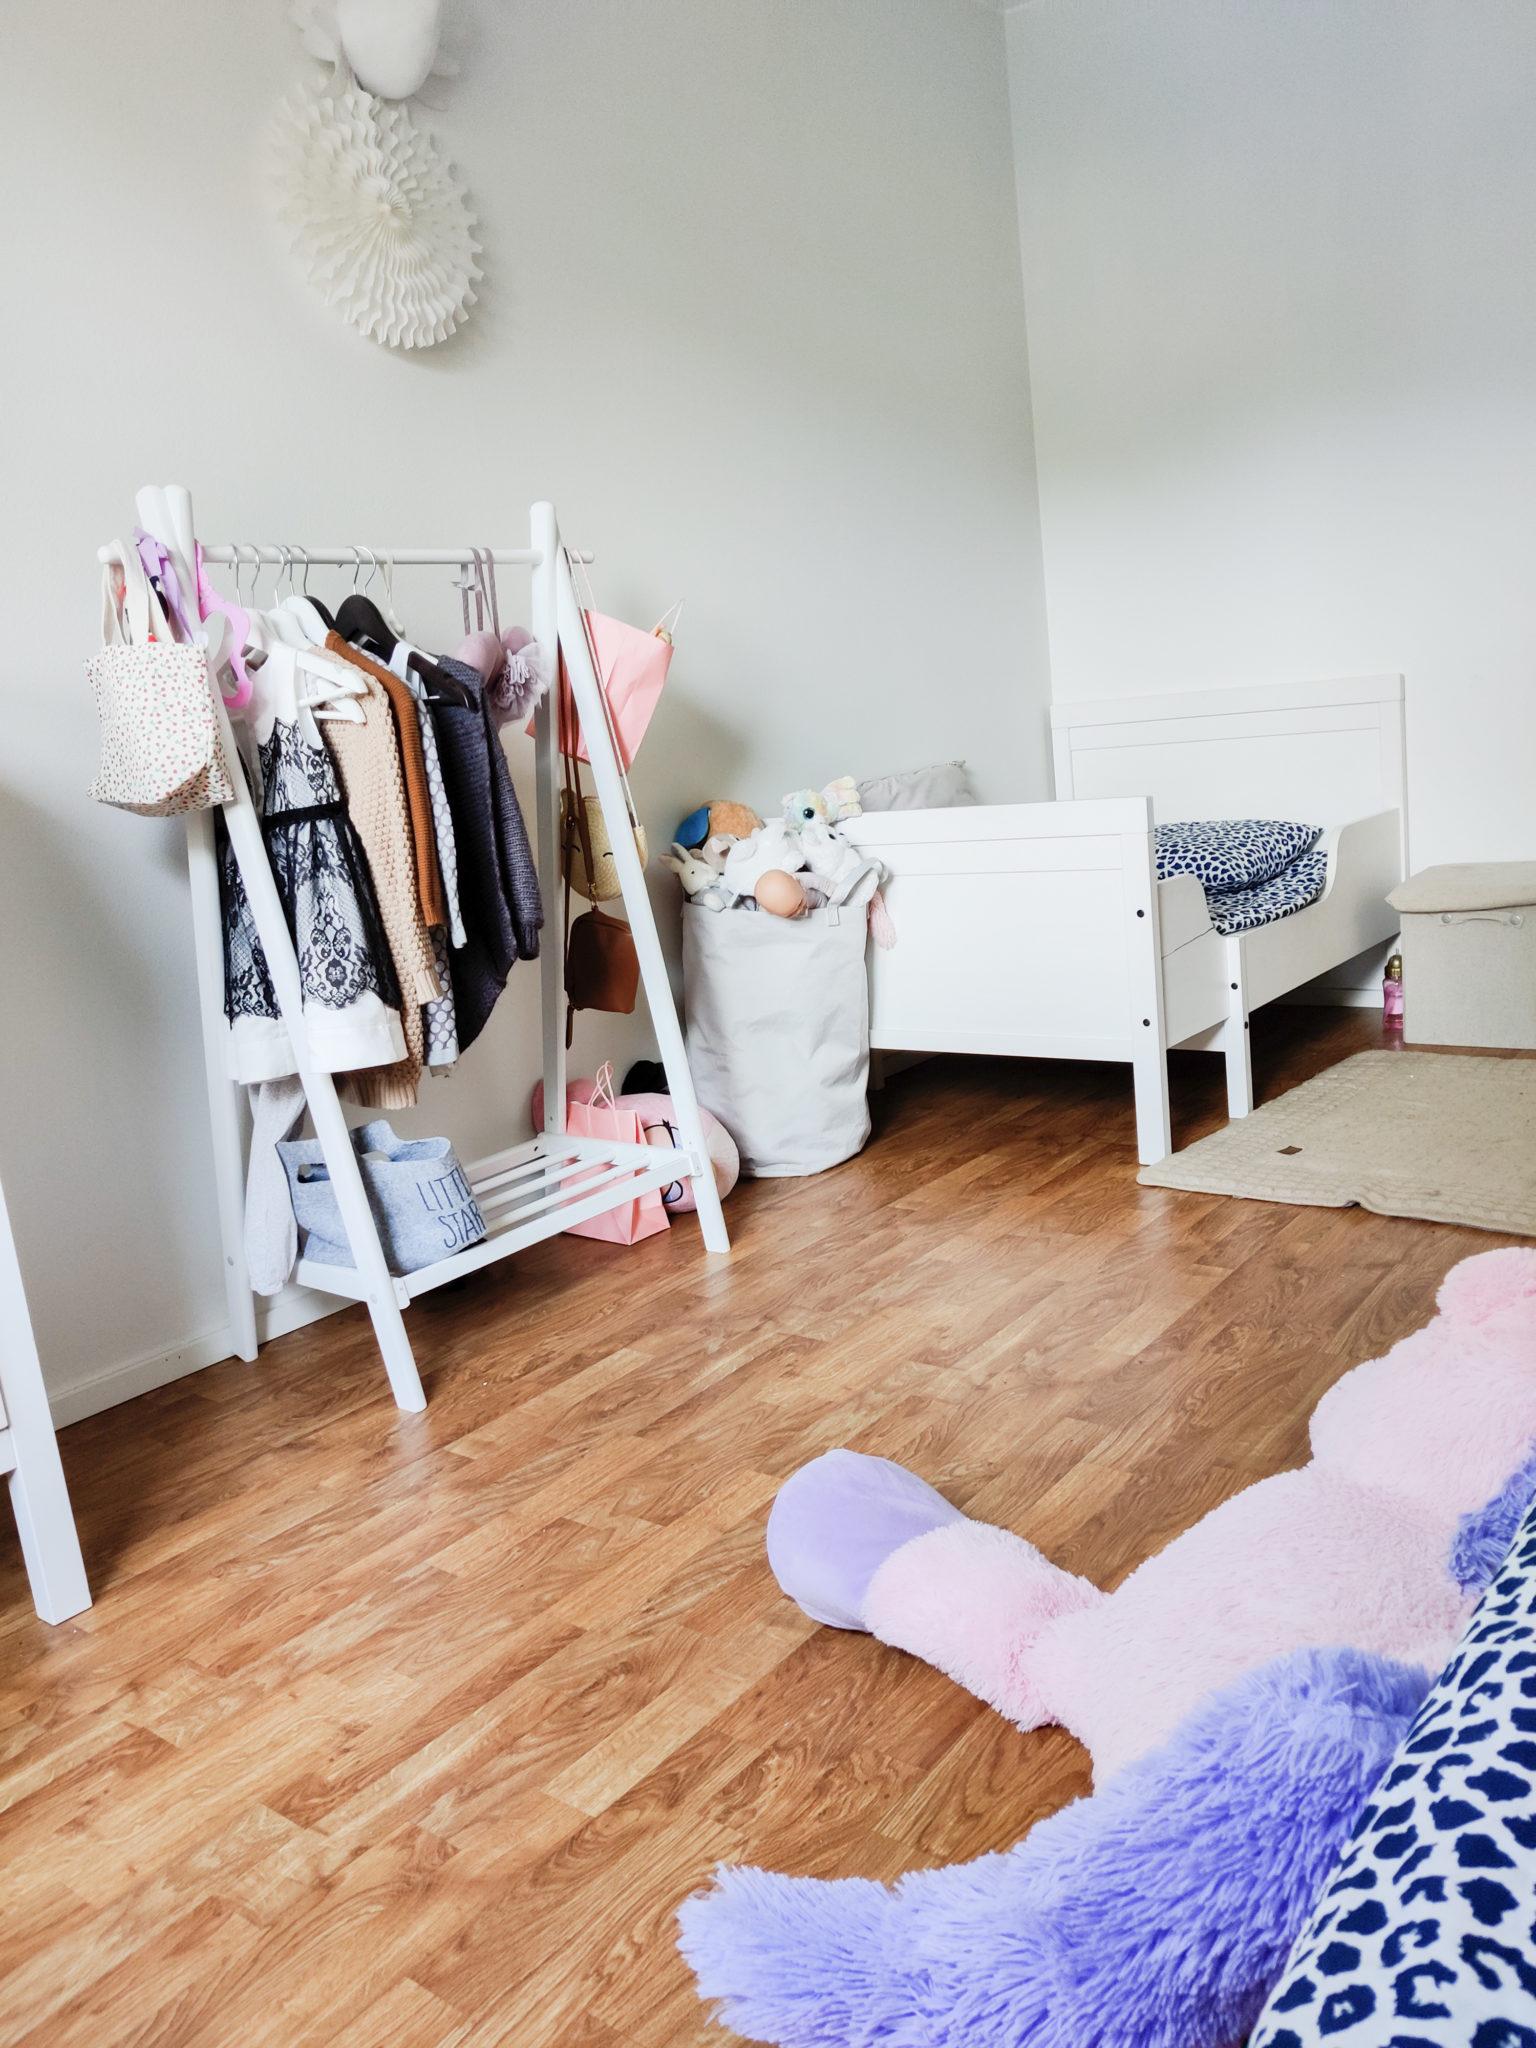 Jatkettava lastensänky - BMH - Big mamas home by Jenni